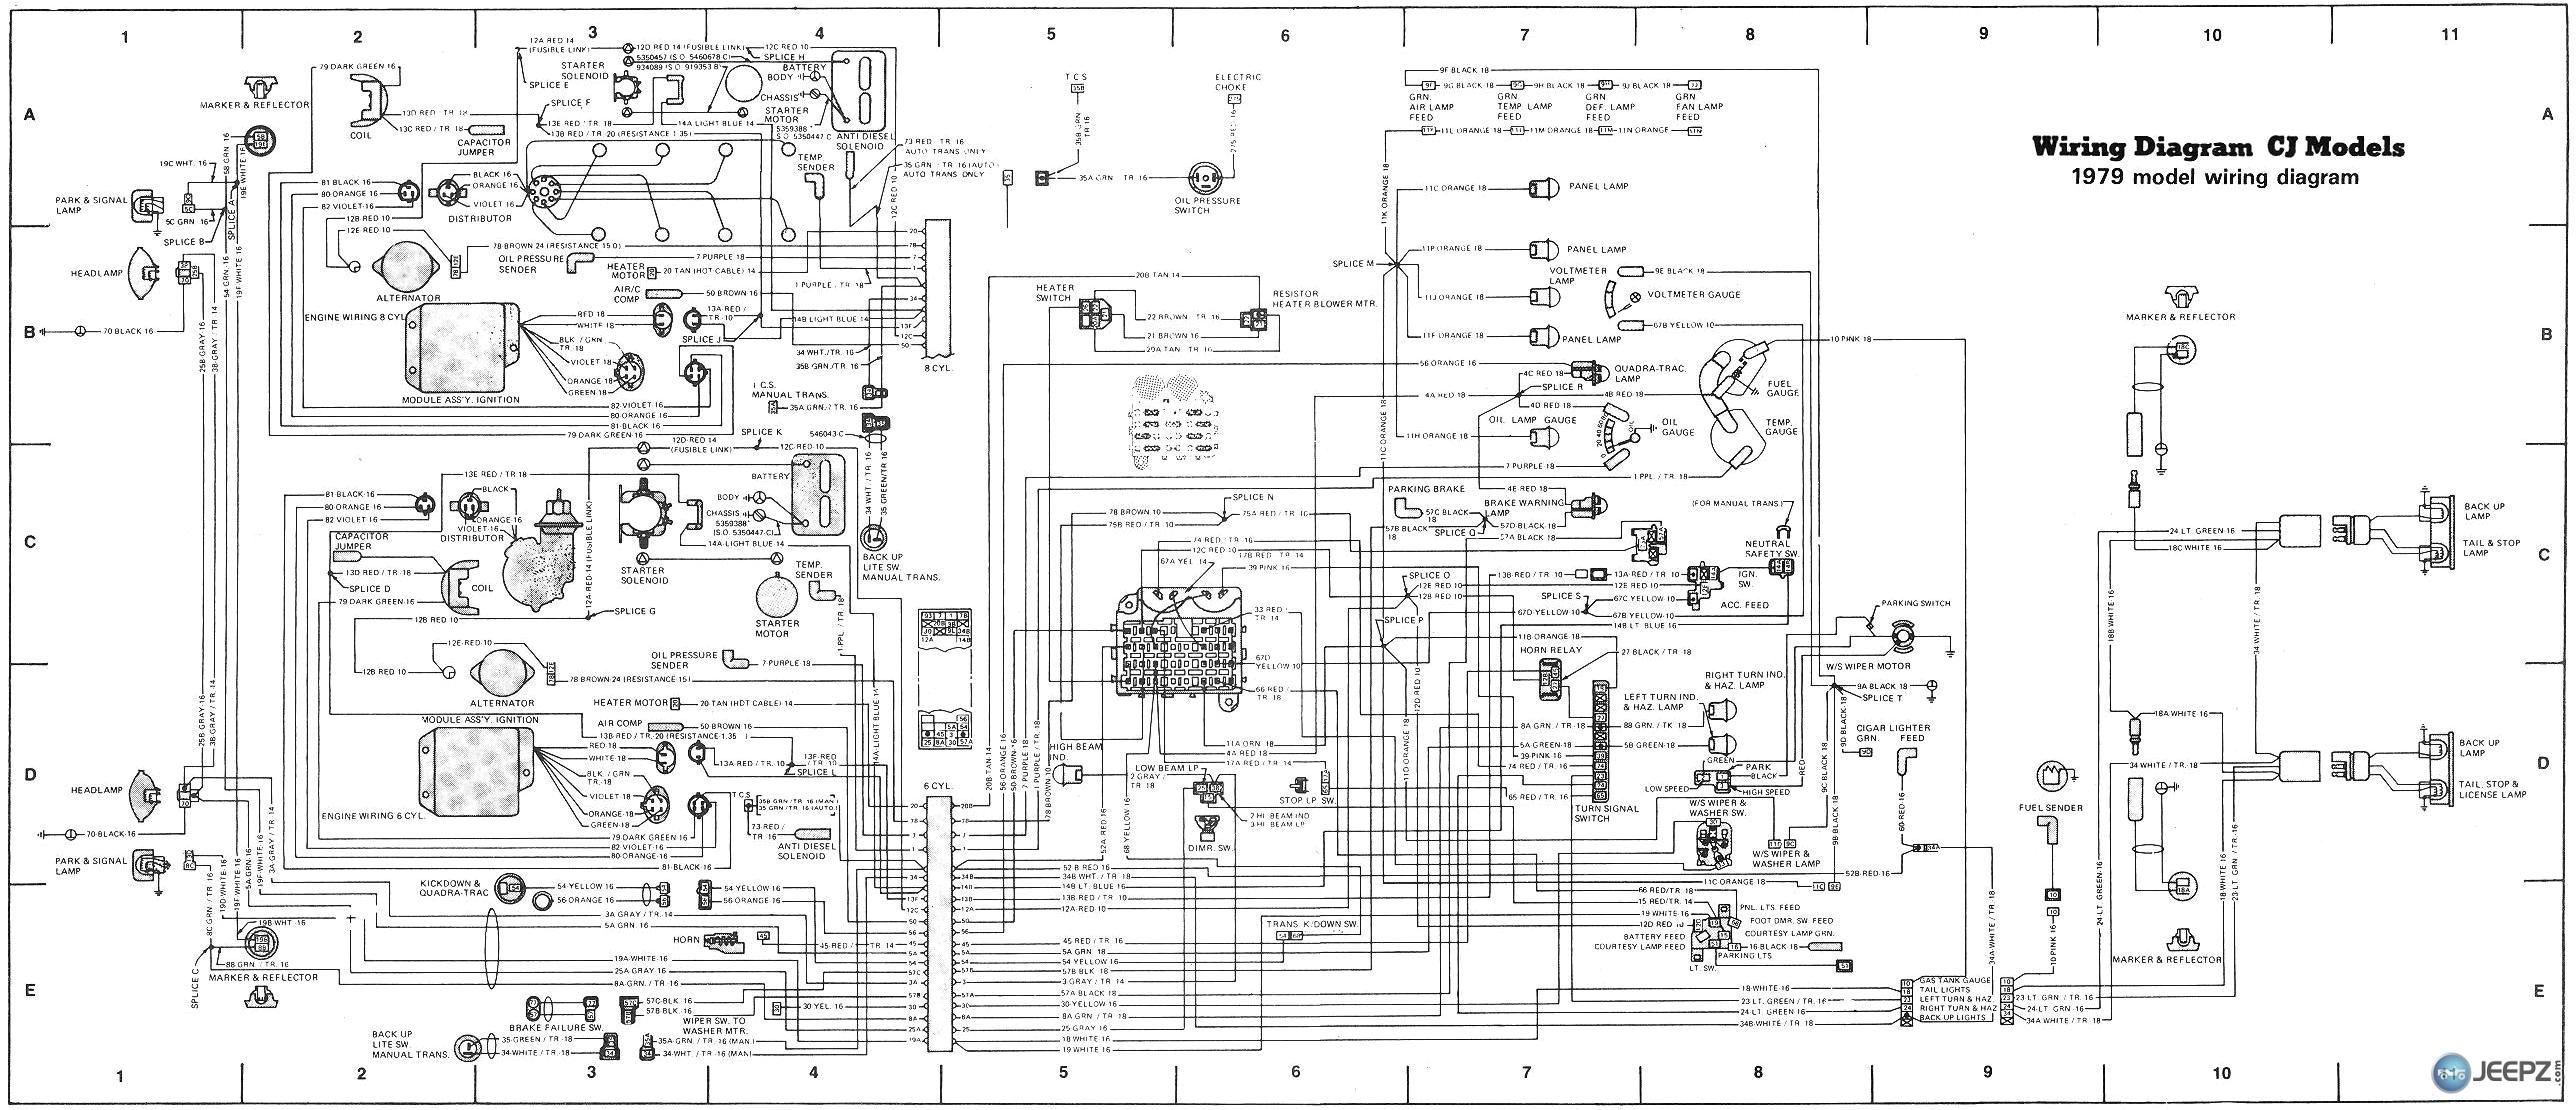 jeep cj7 electrical schematic wiring diagram toolbox jeep cj5 electrical diagrams 81 jeep cj7 wiring share